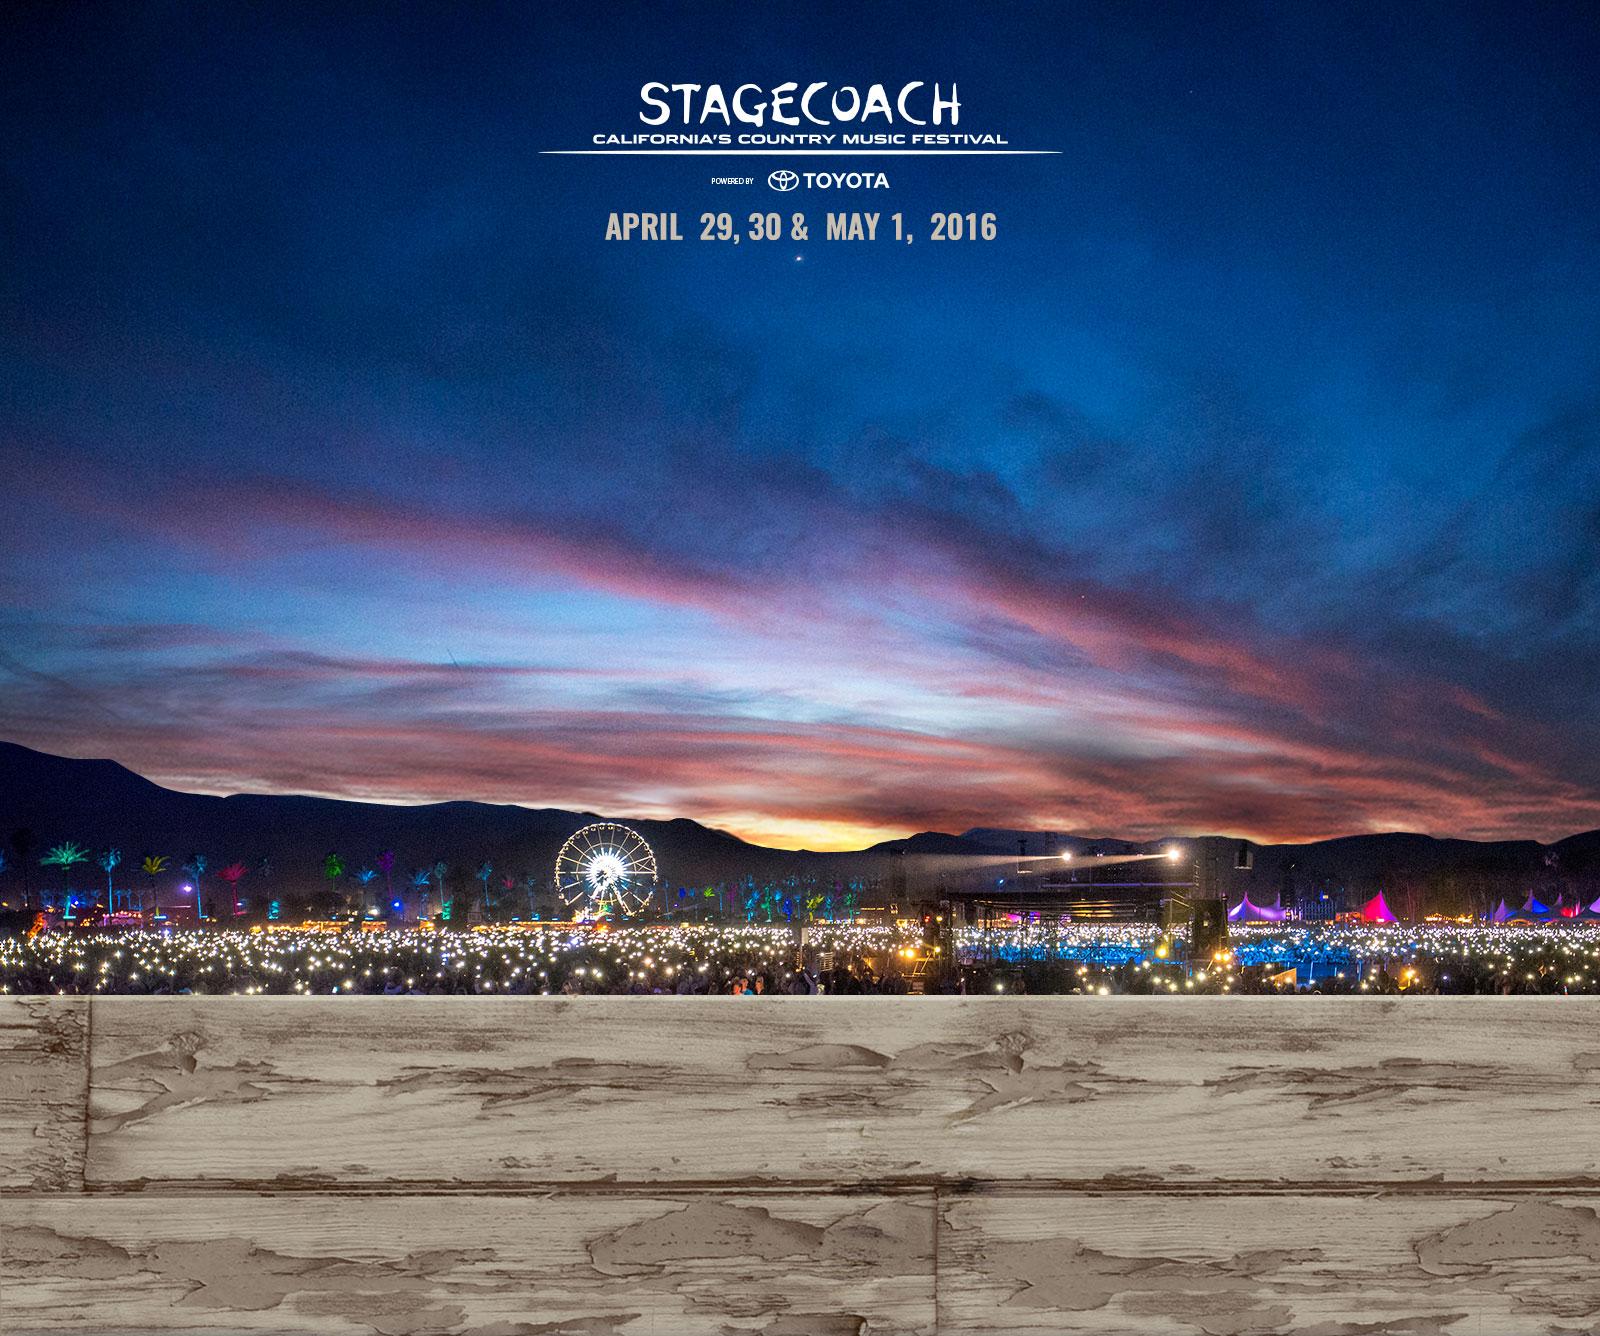 Stagecoach 2016